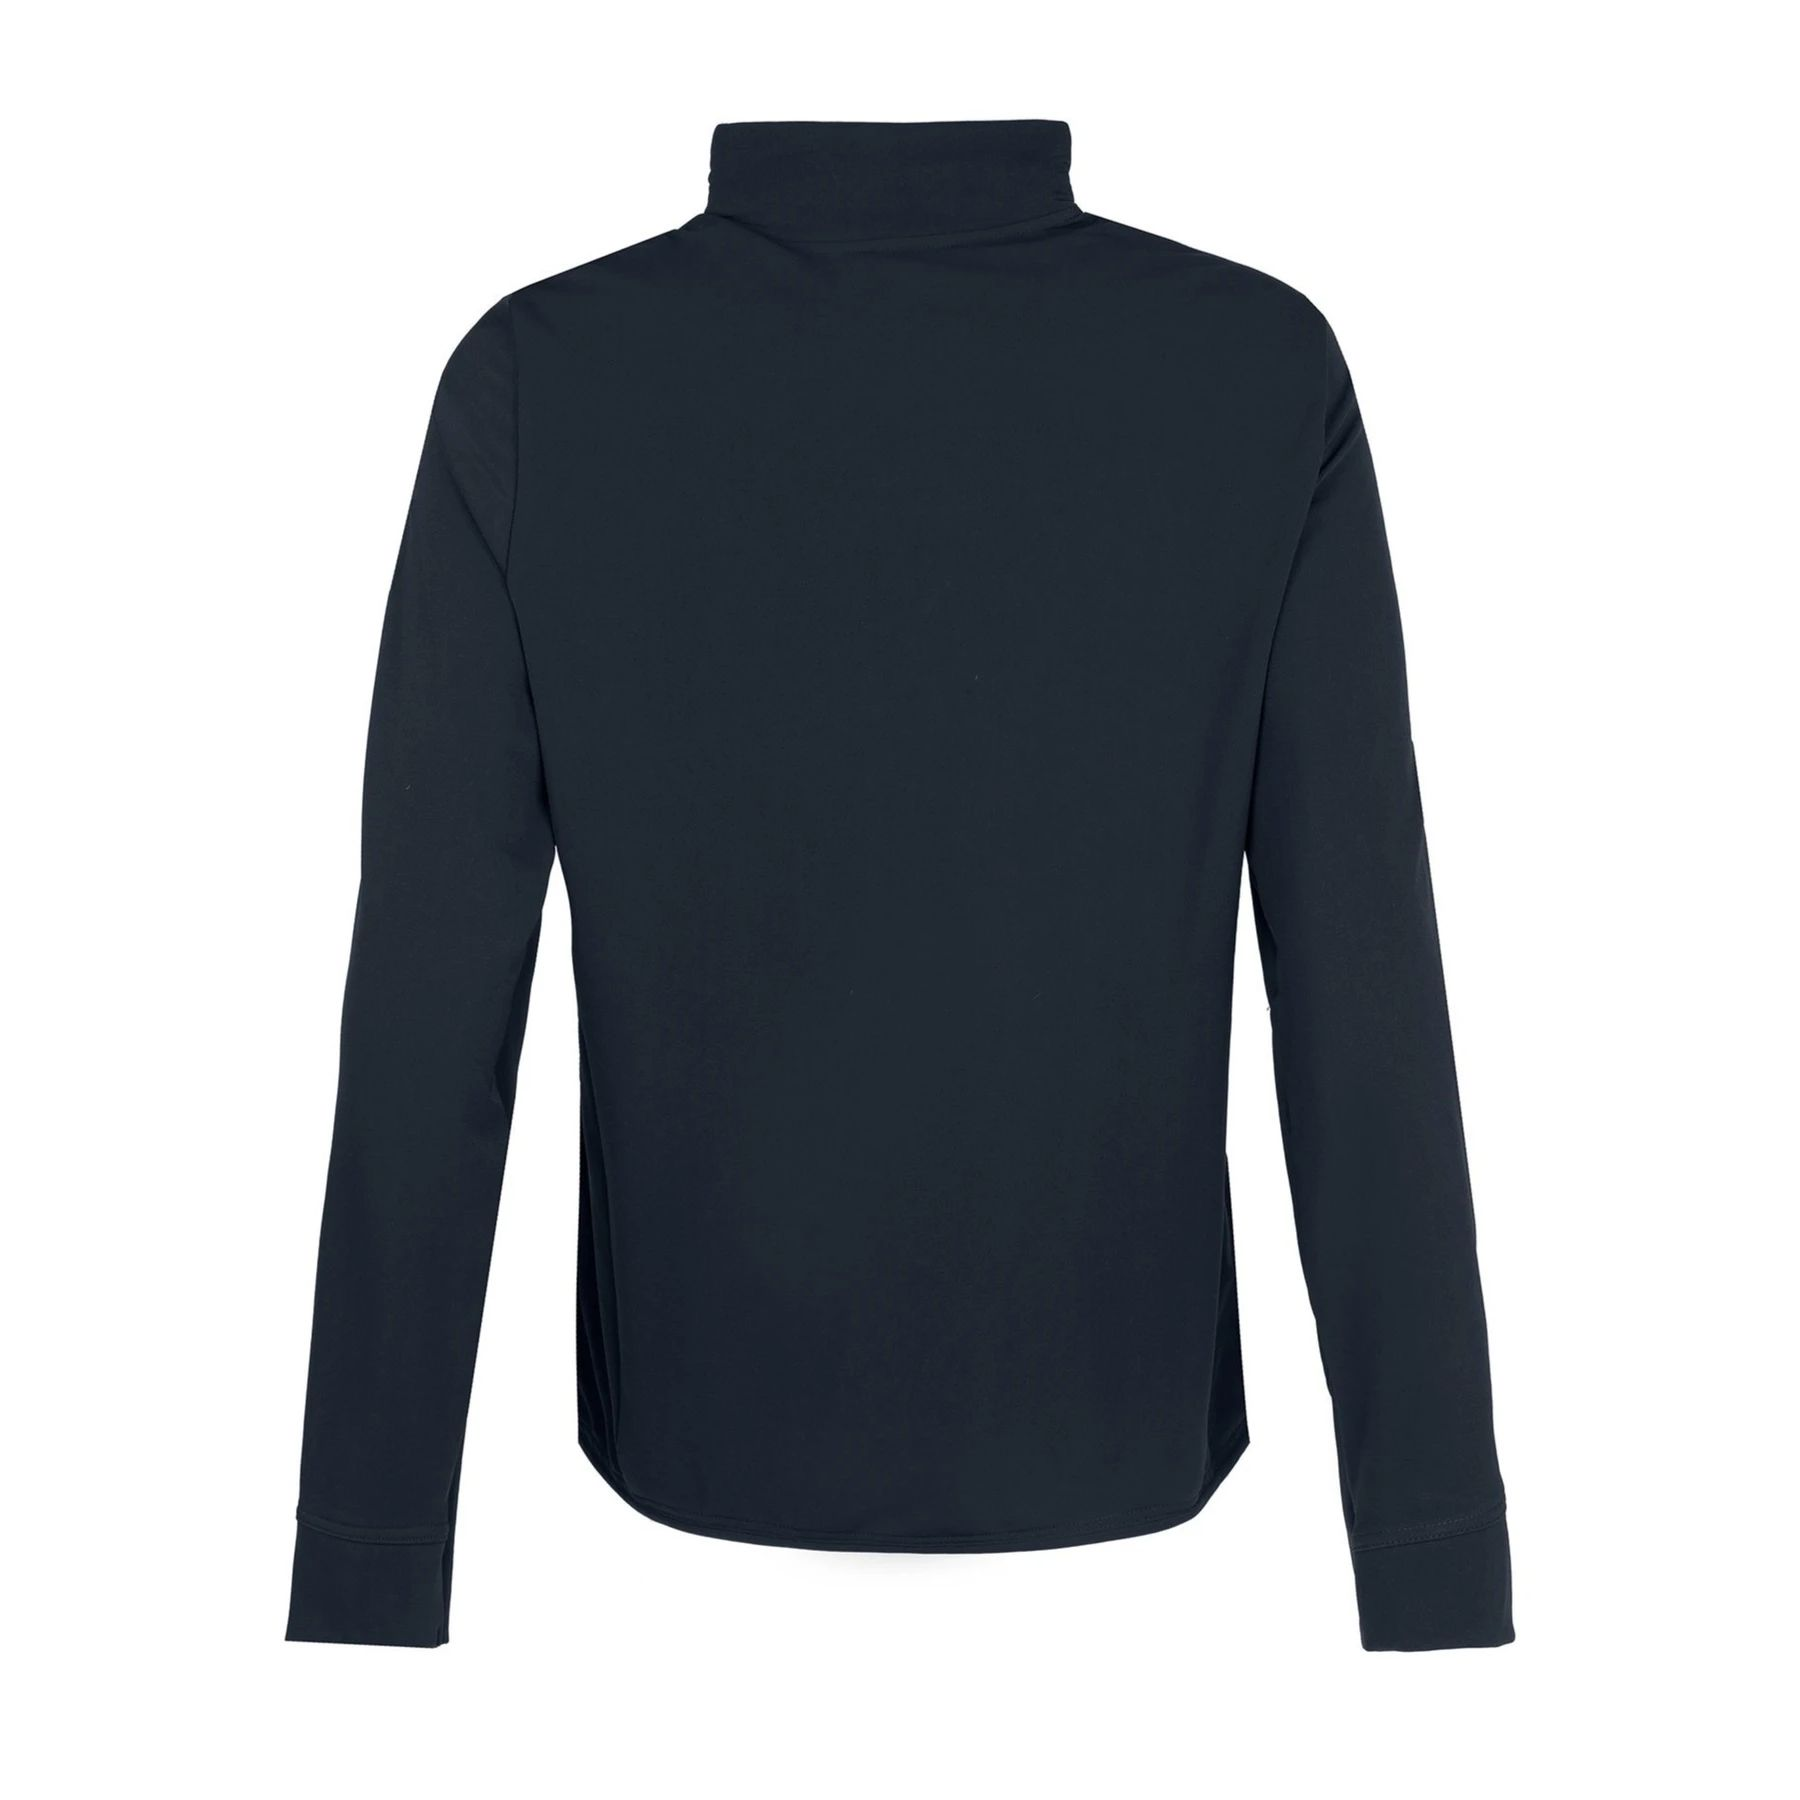 Îmbrăcăminte -  rock experience Parker men hybrid jacket